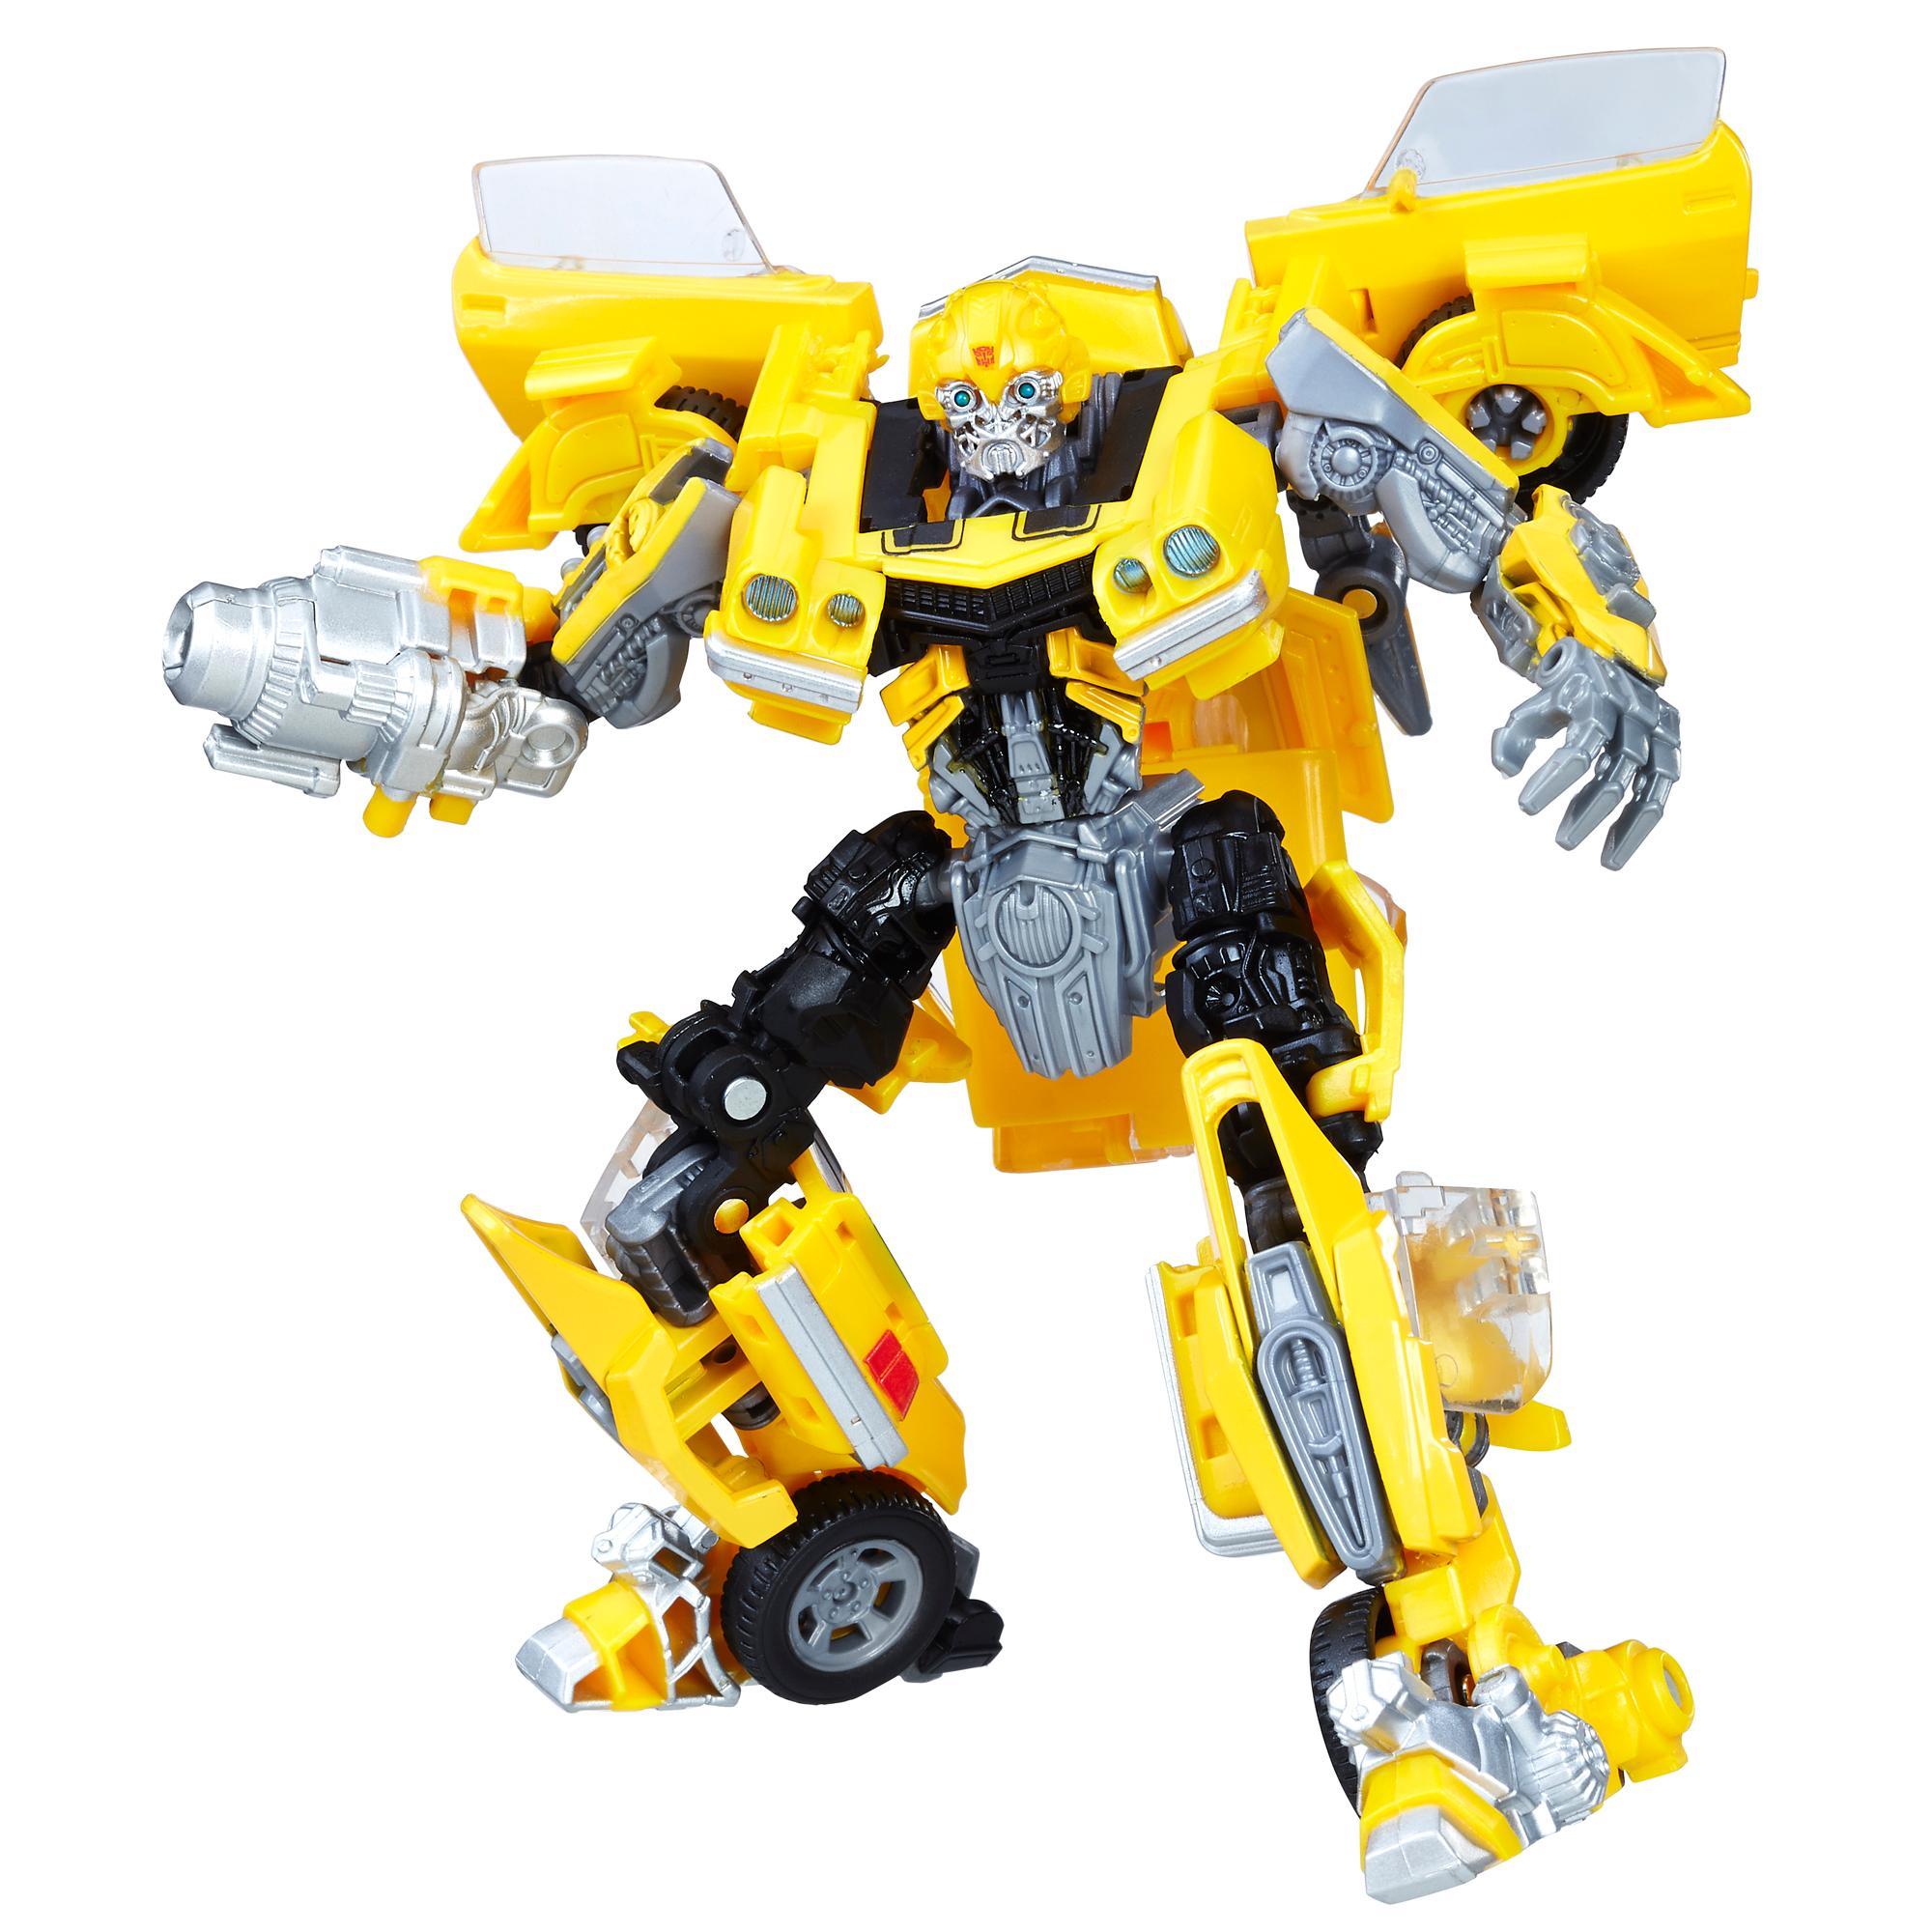 Transformers Filmleri Serisi Figür - Bumblebee